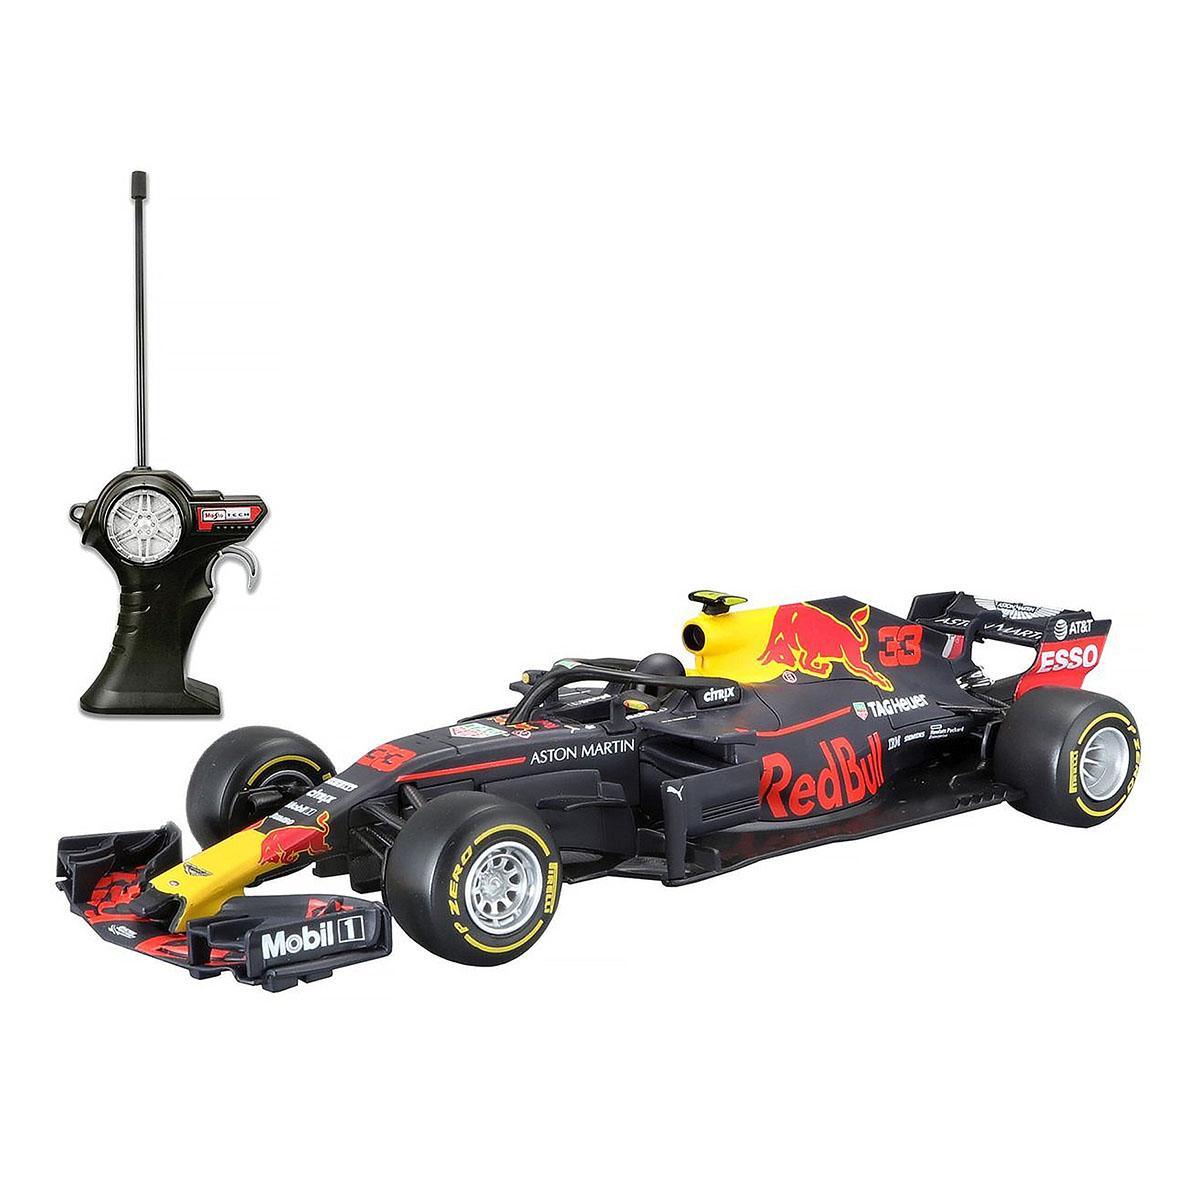 Masinuta cu telecomanda Maisto Aston Martin RB14 Max Verstappen. 1:24. 27 MHz